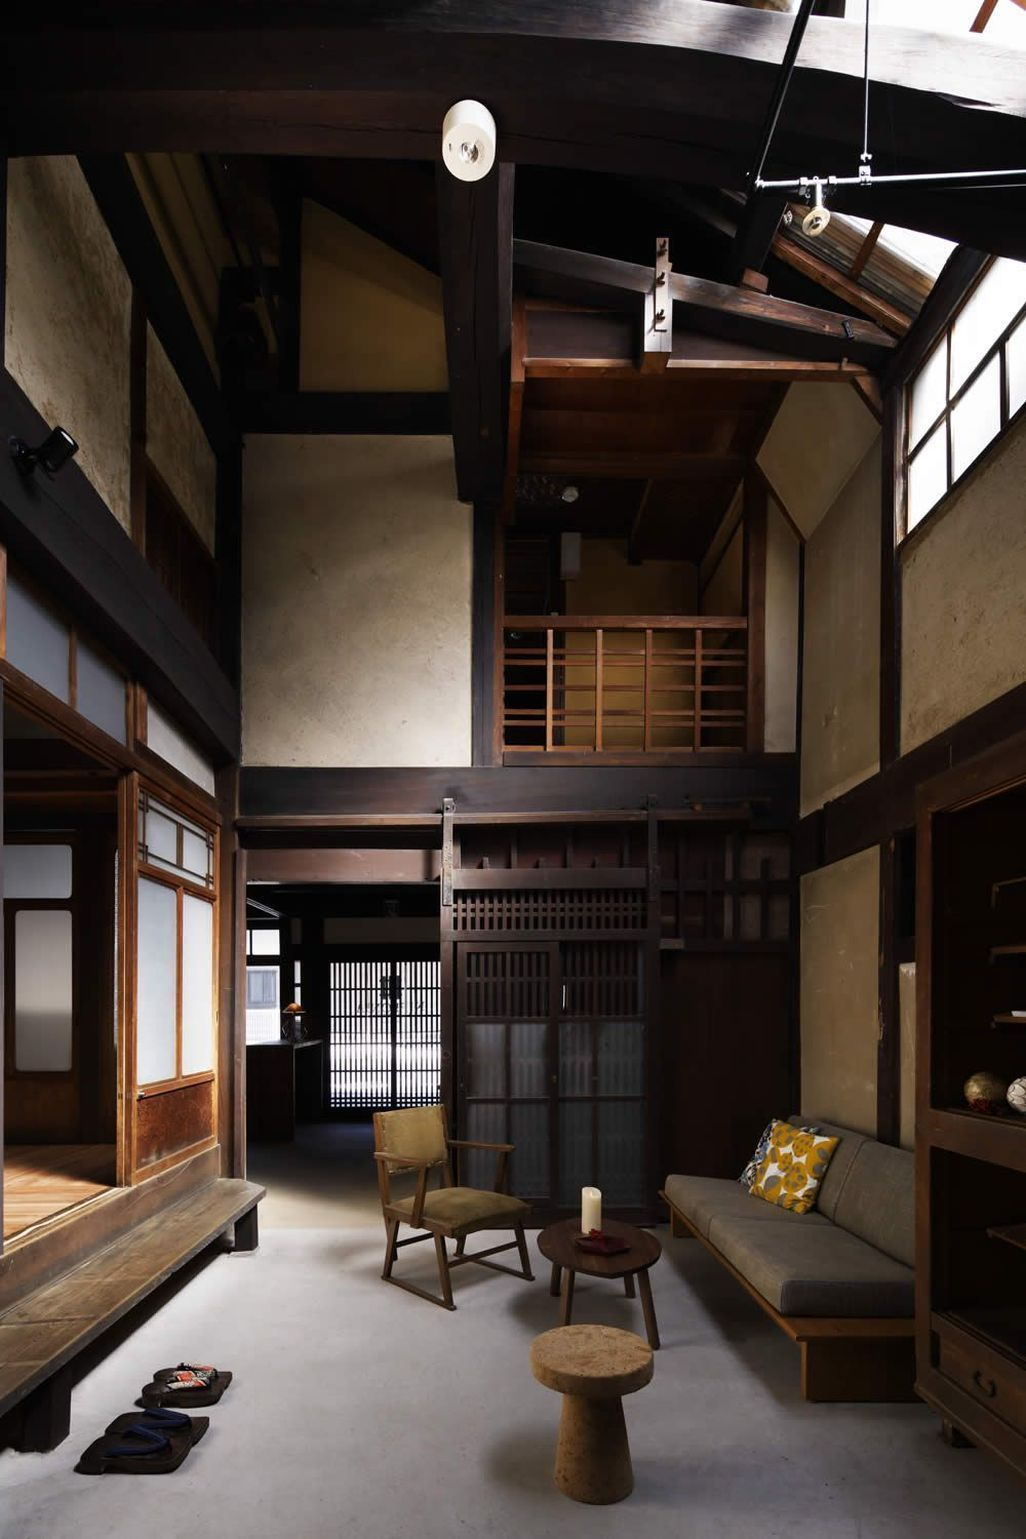 41 amazing traditional japanese living room decorating ideas japanese style house japanese on kitchen interior japanese style id=78372